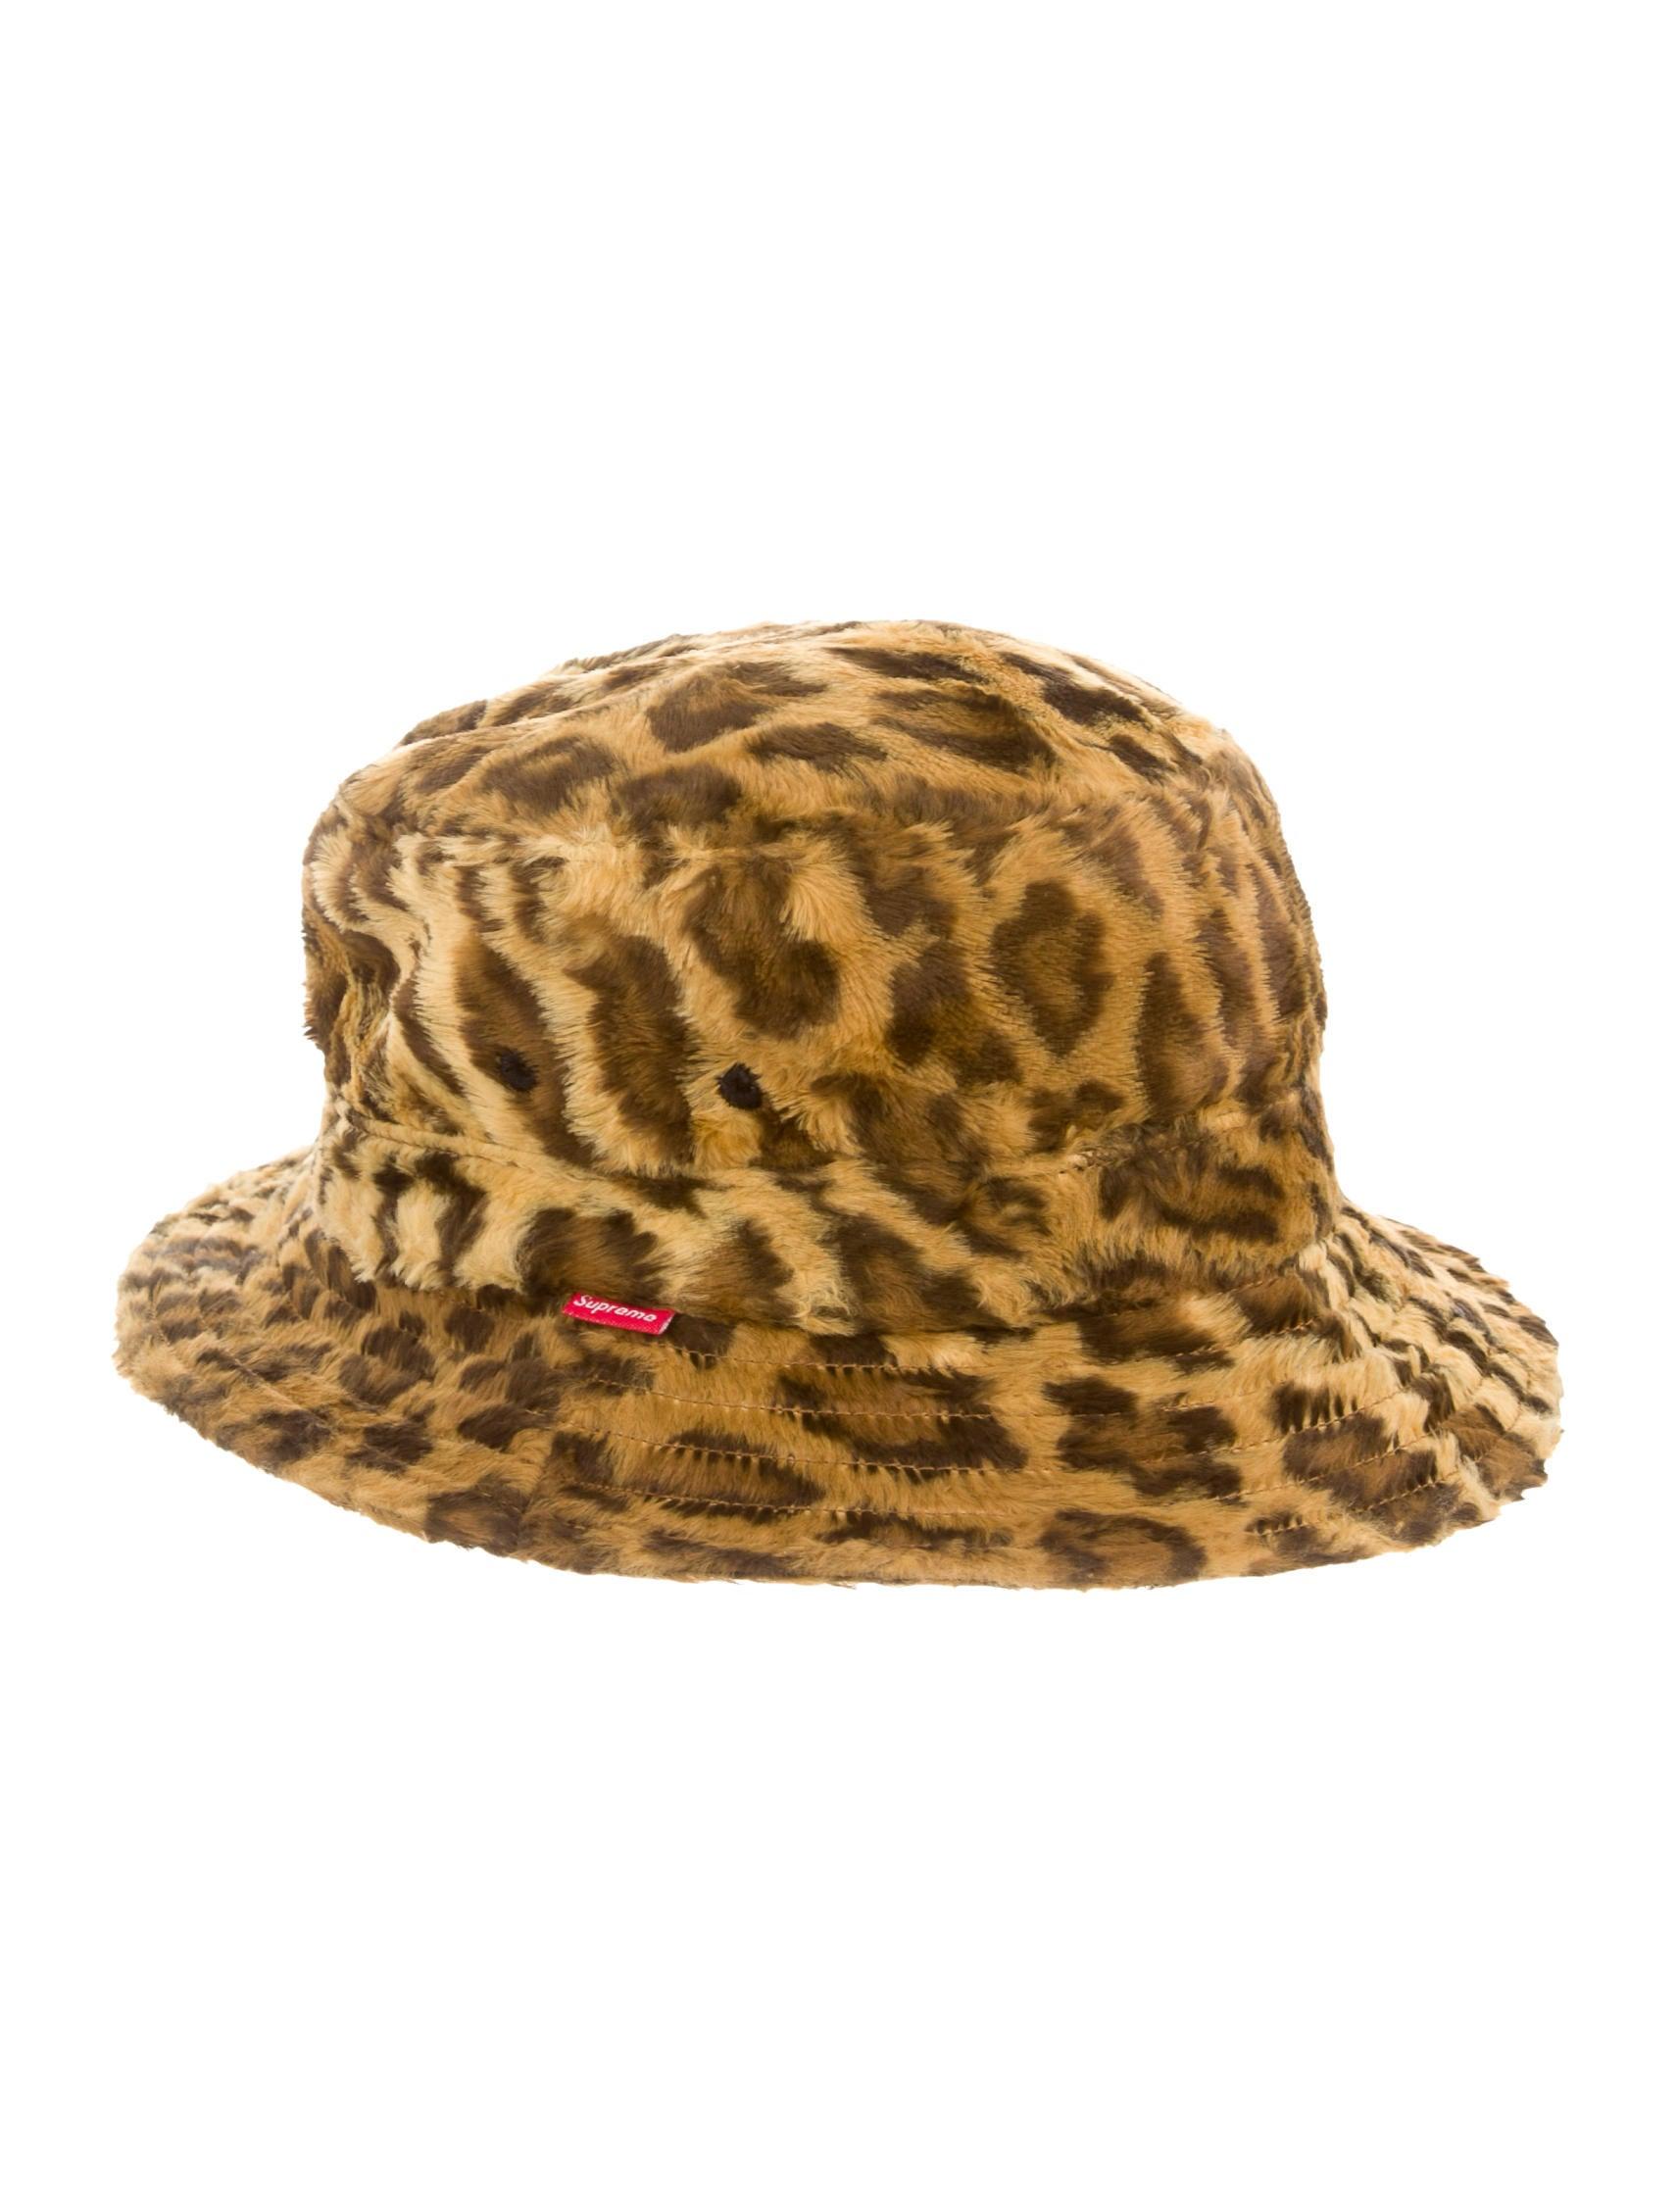 Supreme Leopard Print Bucket Hat - Accessories - WSPME20113  d0254ebb077